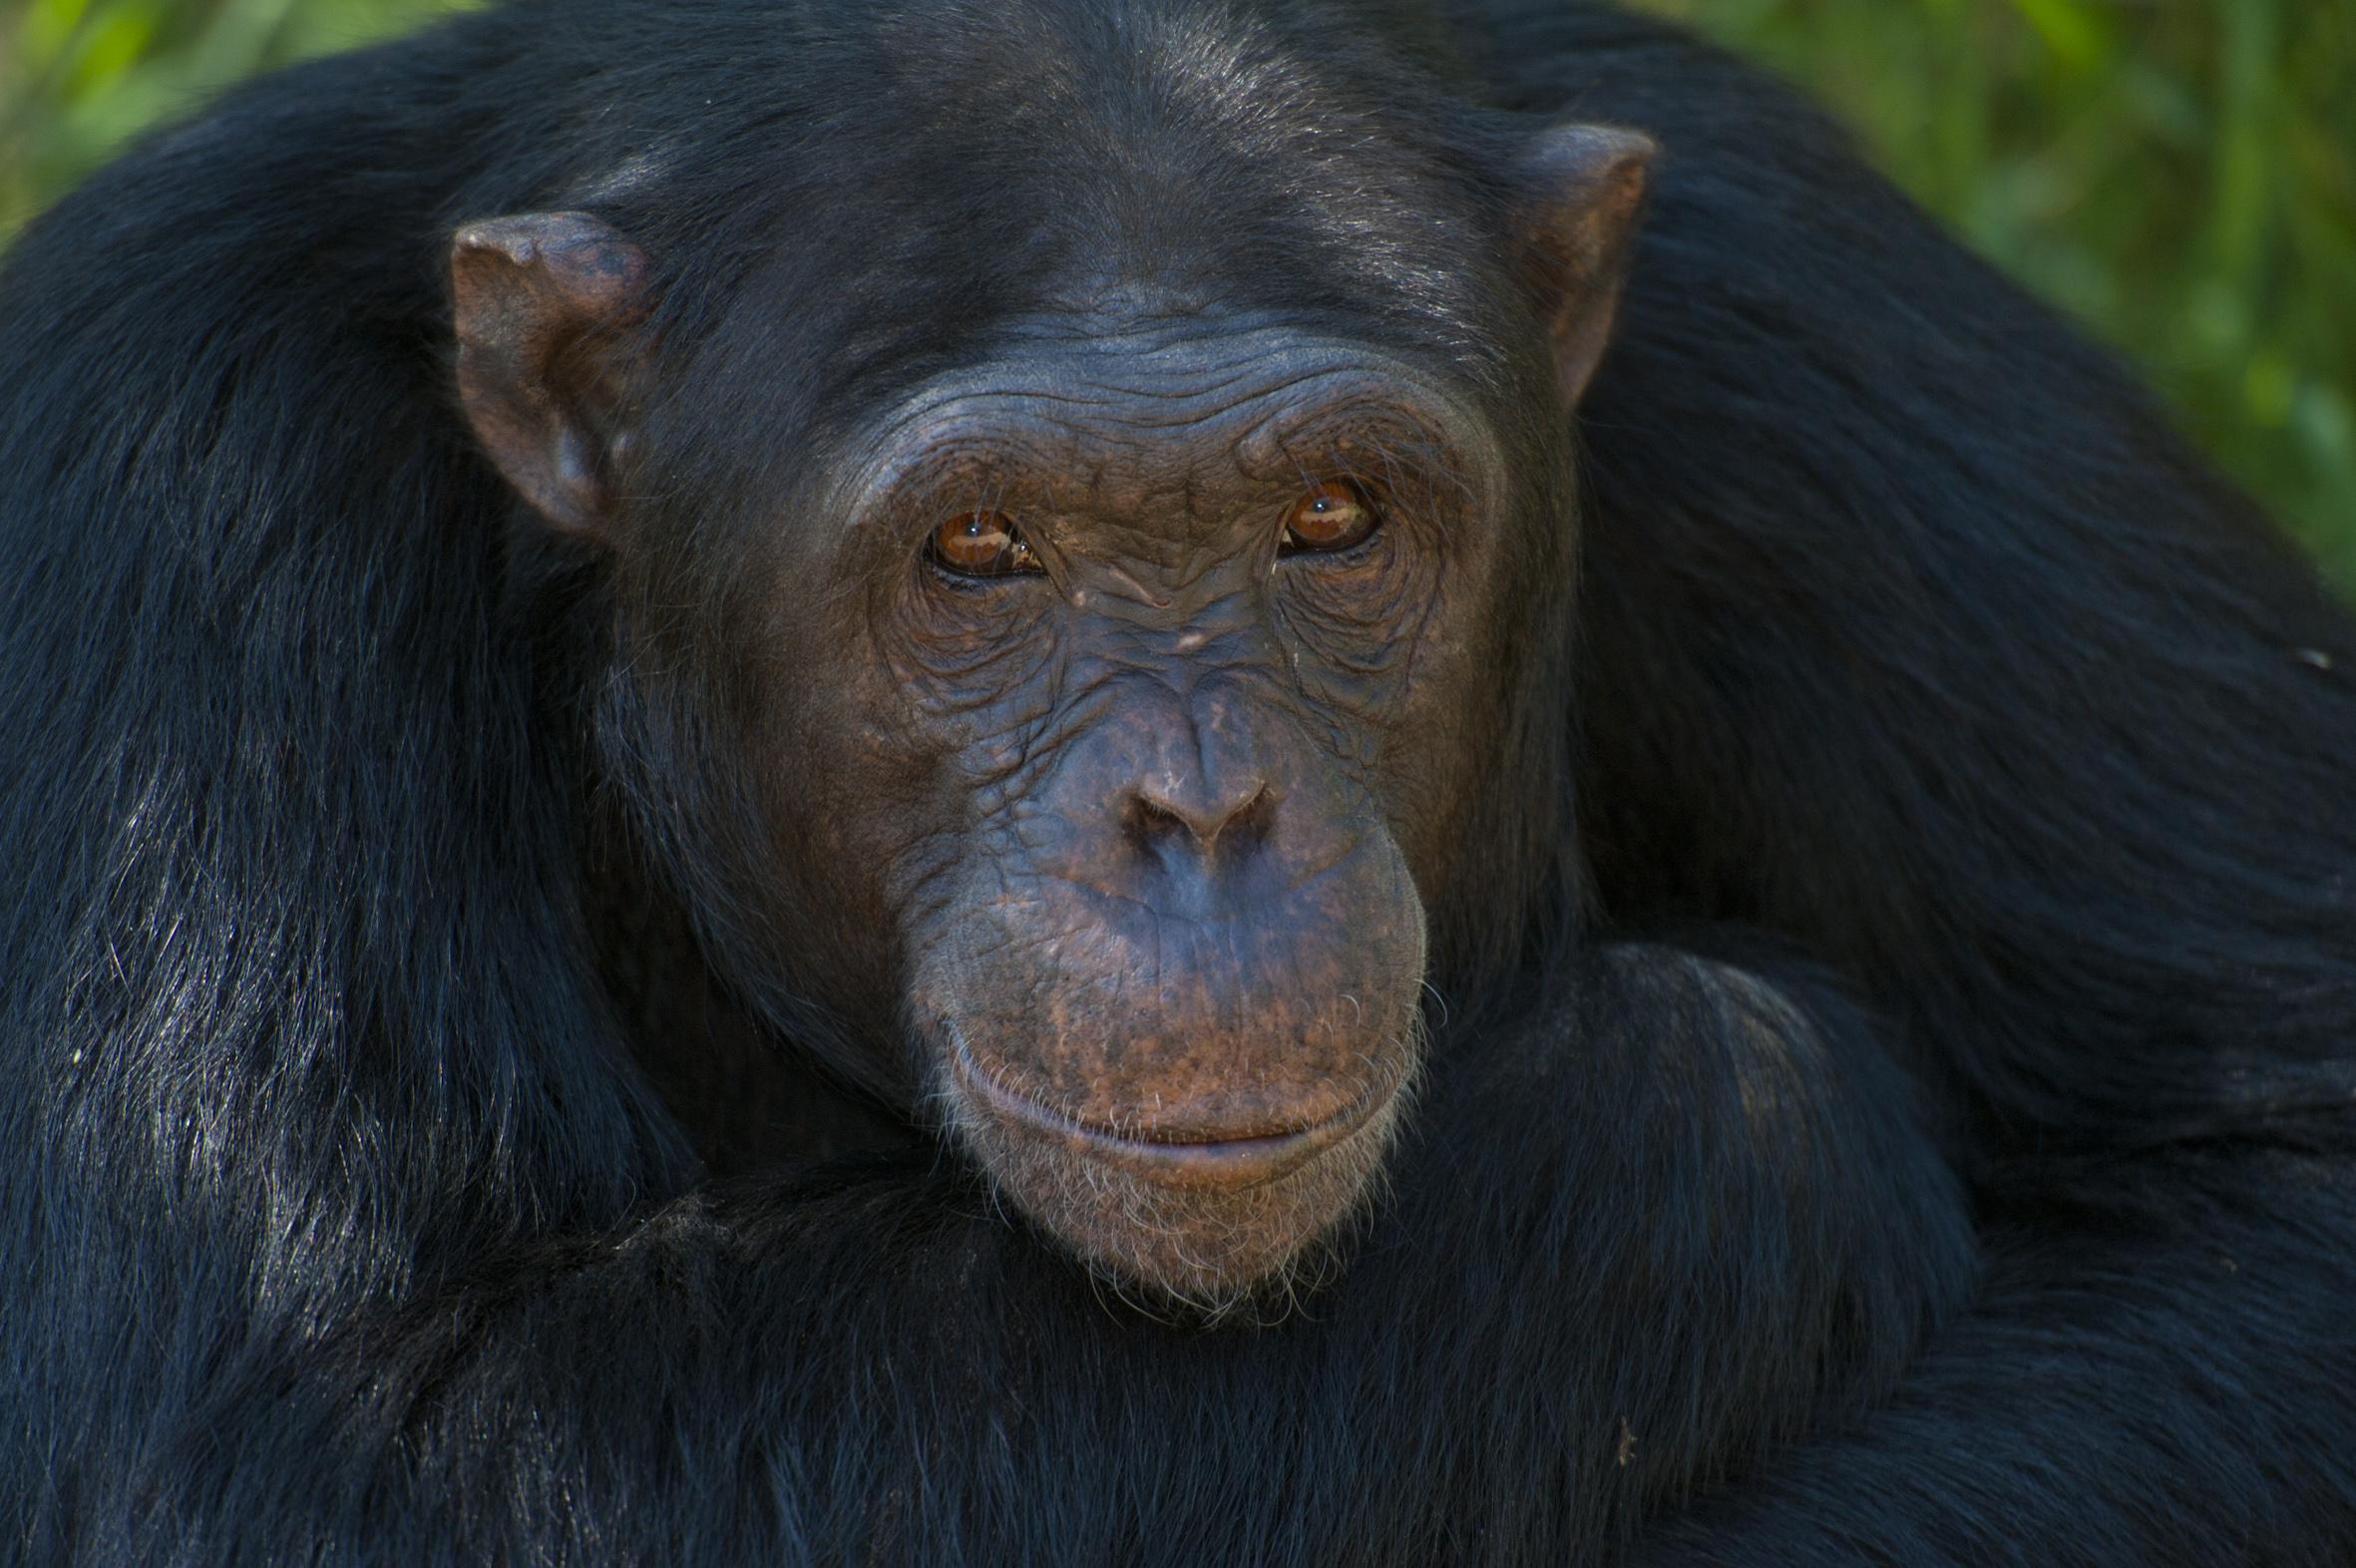 Chimpanzee in the chimpanzee sanctuary, Ol Pejeta Conservancy, Kenya. © Ian Cumming / icimages.com / Ol Pejeta Bush Camp